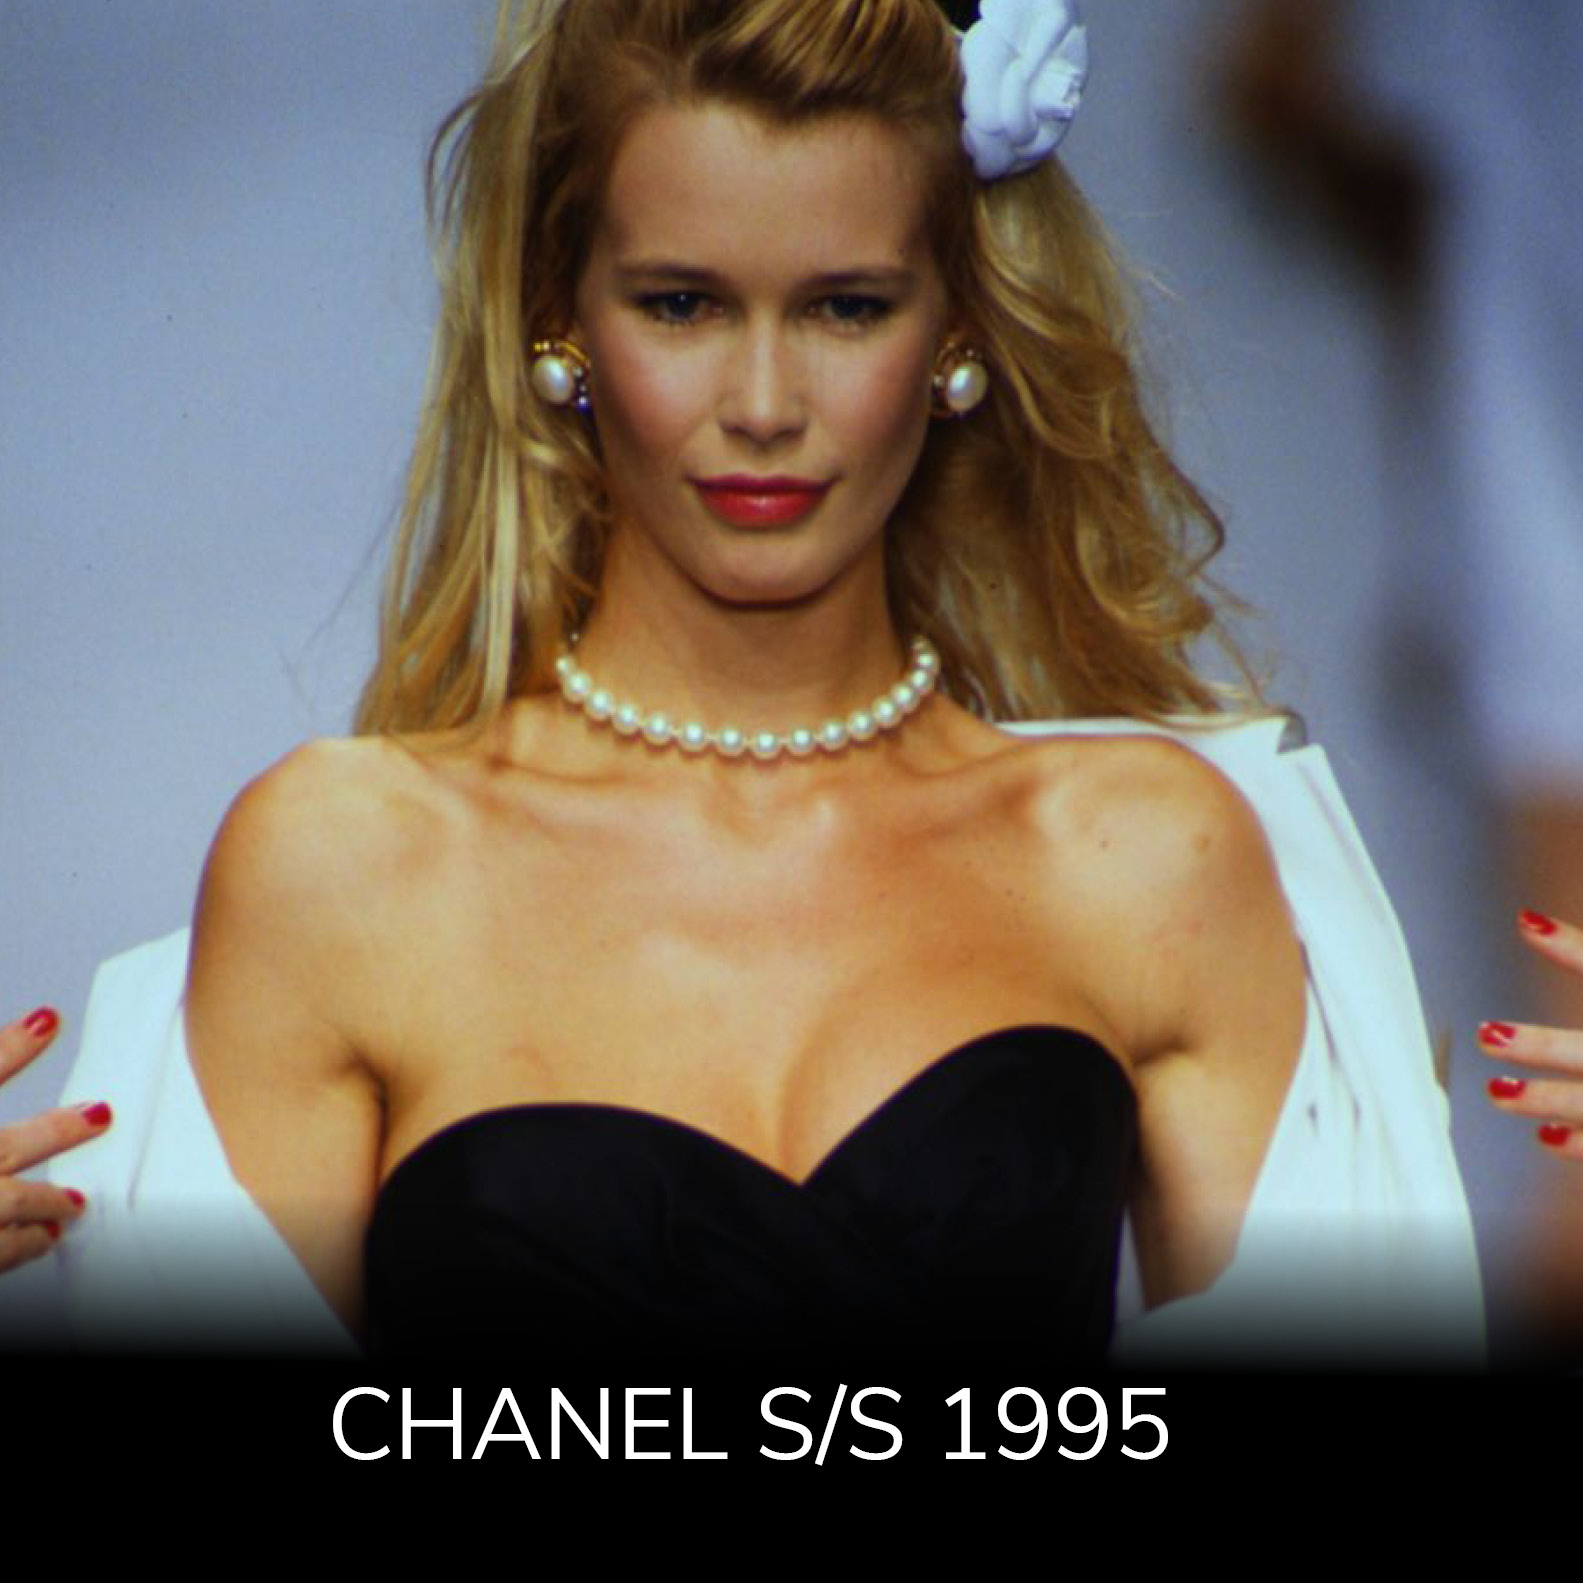 Chanel Spring/Summer 1995